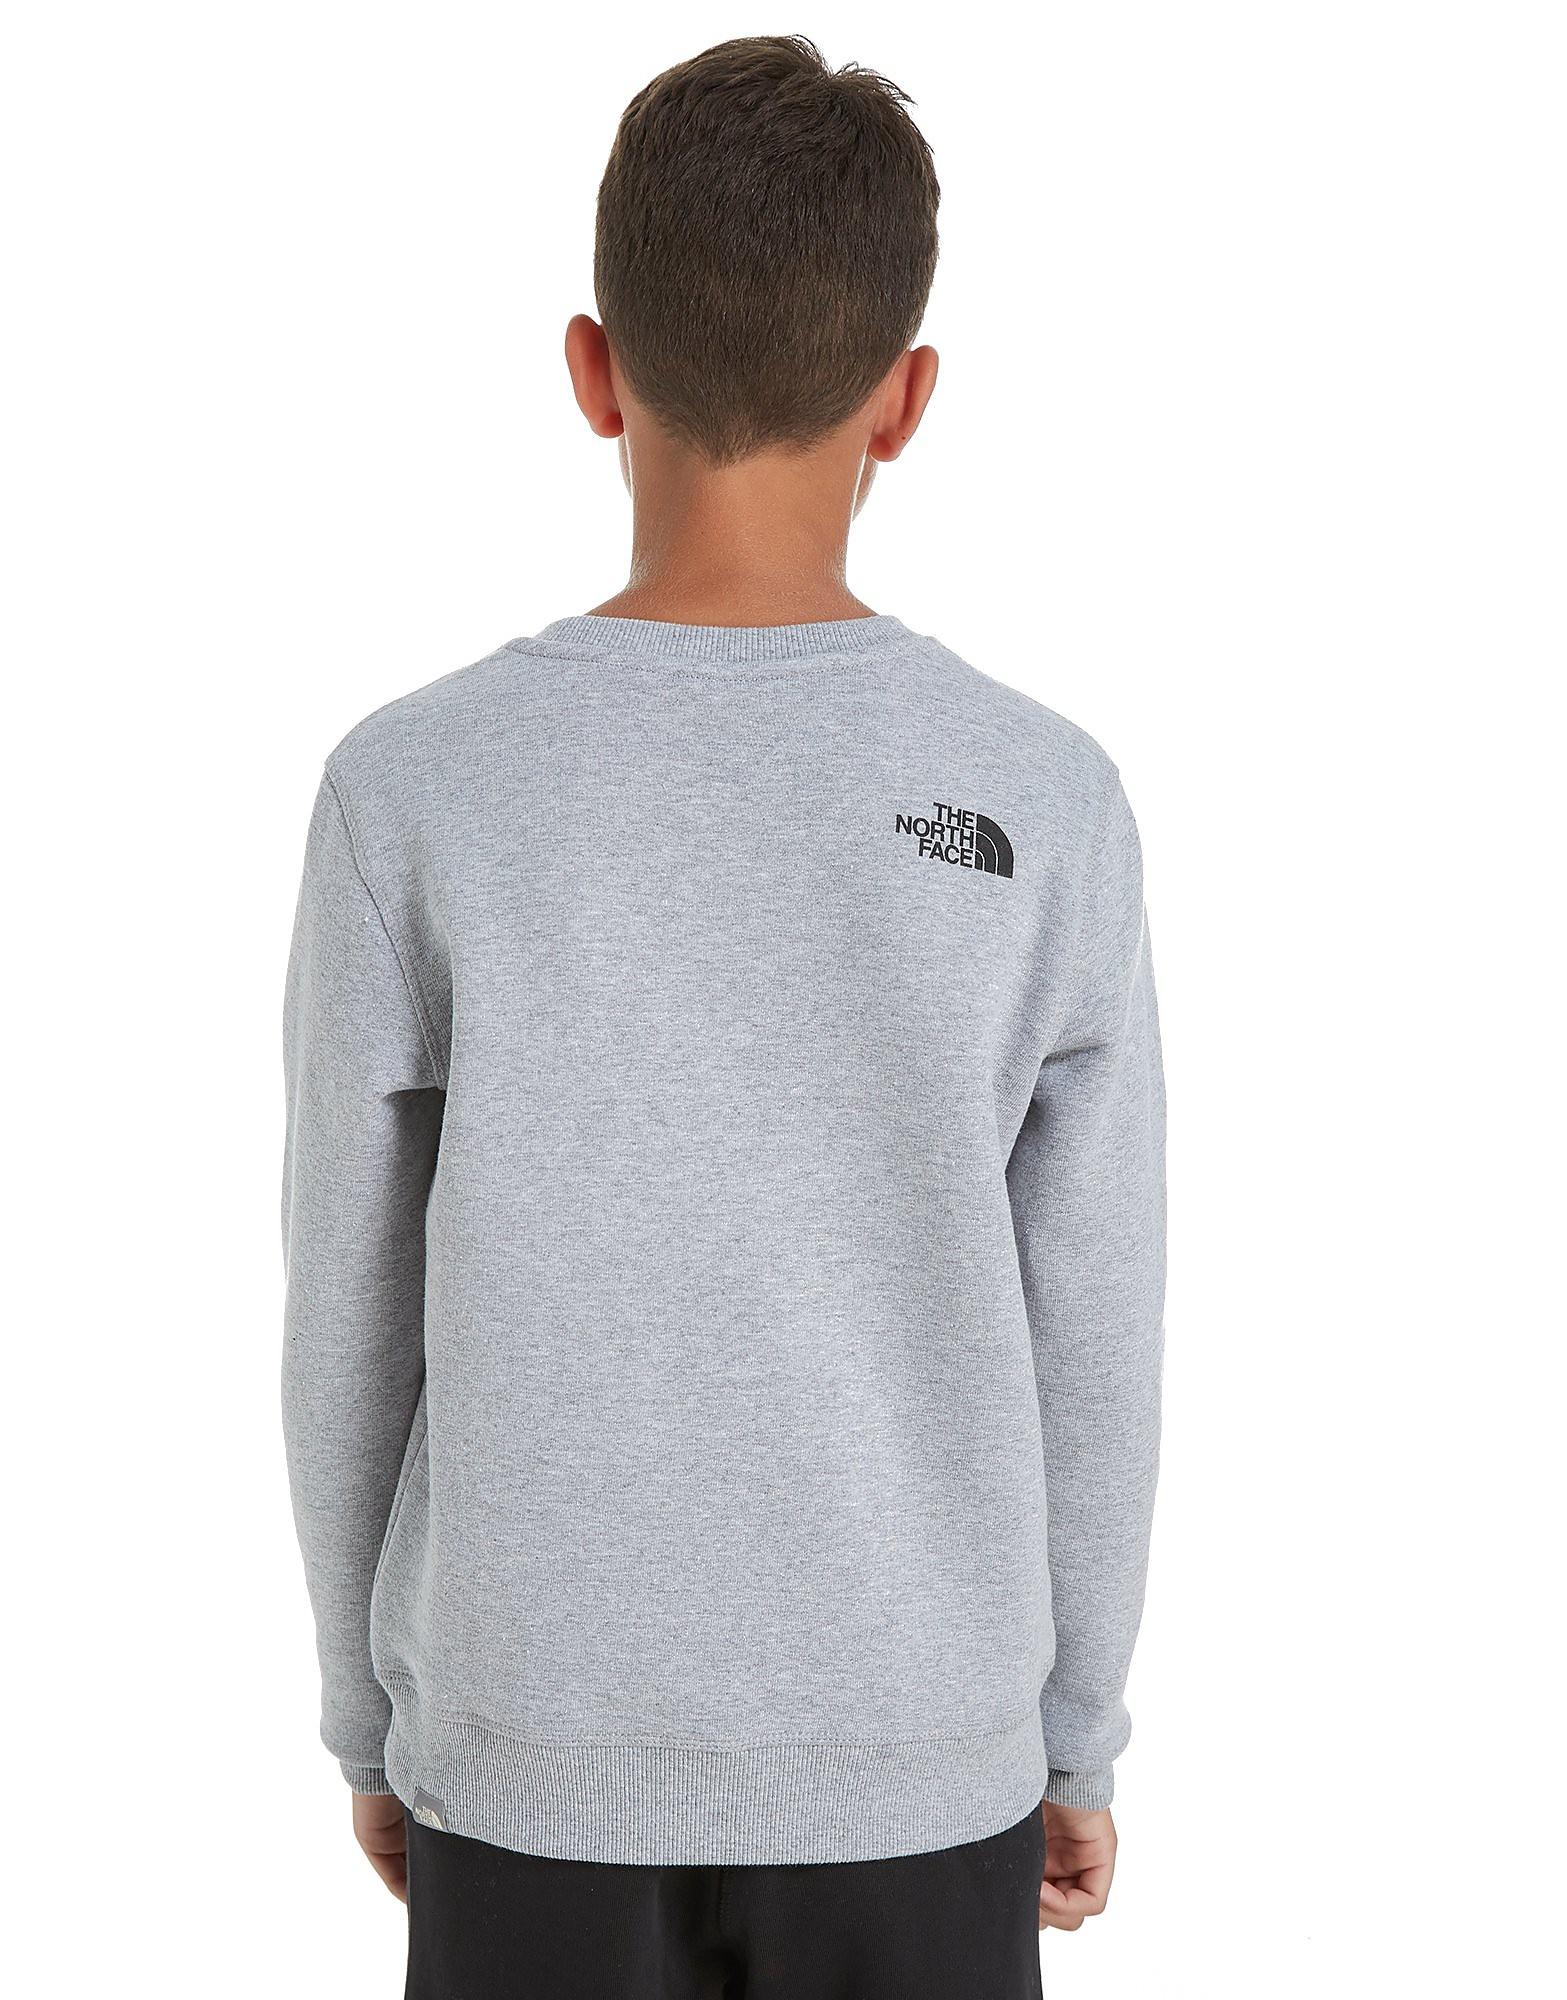 The North Face Boy's Box Crew Sweatshirt